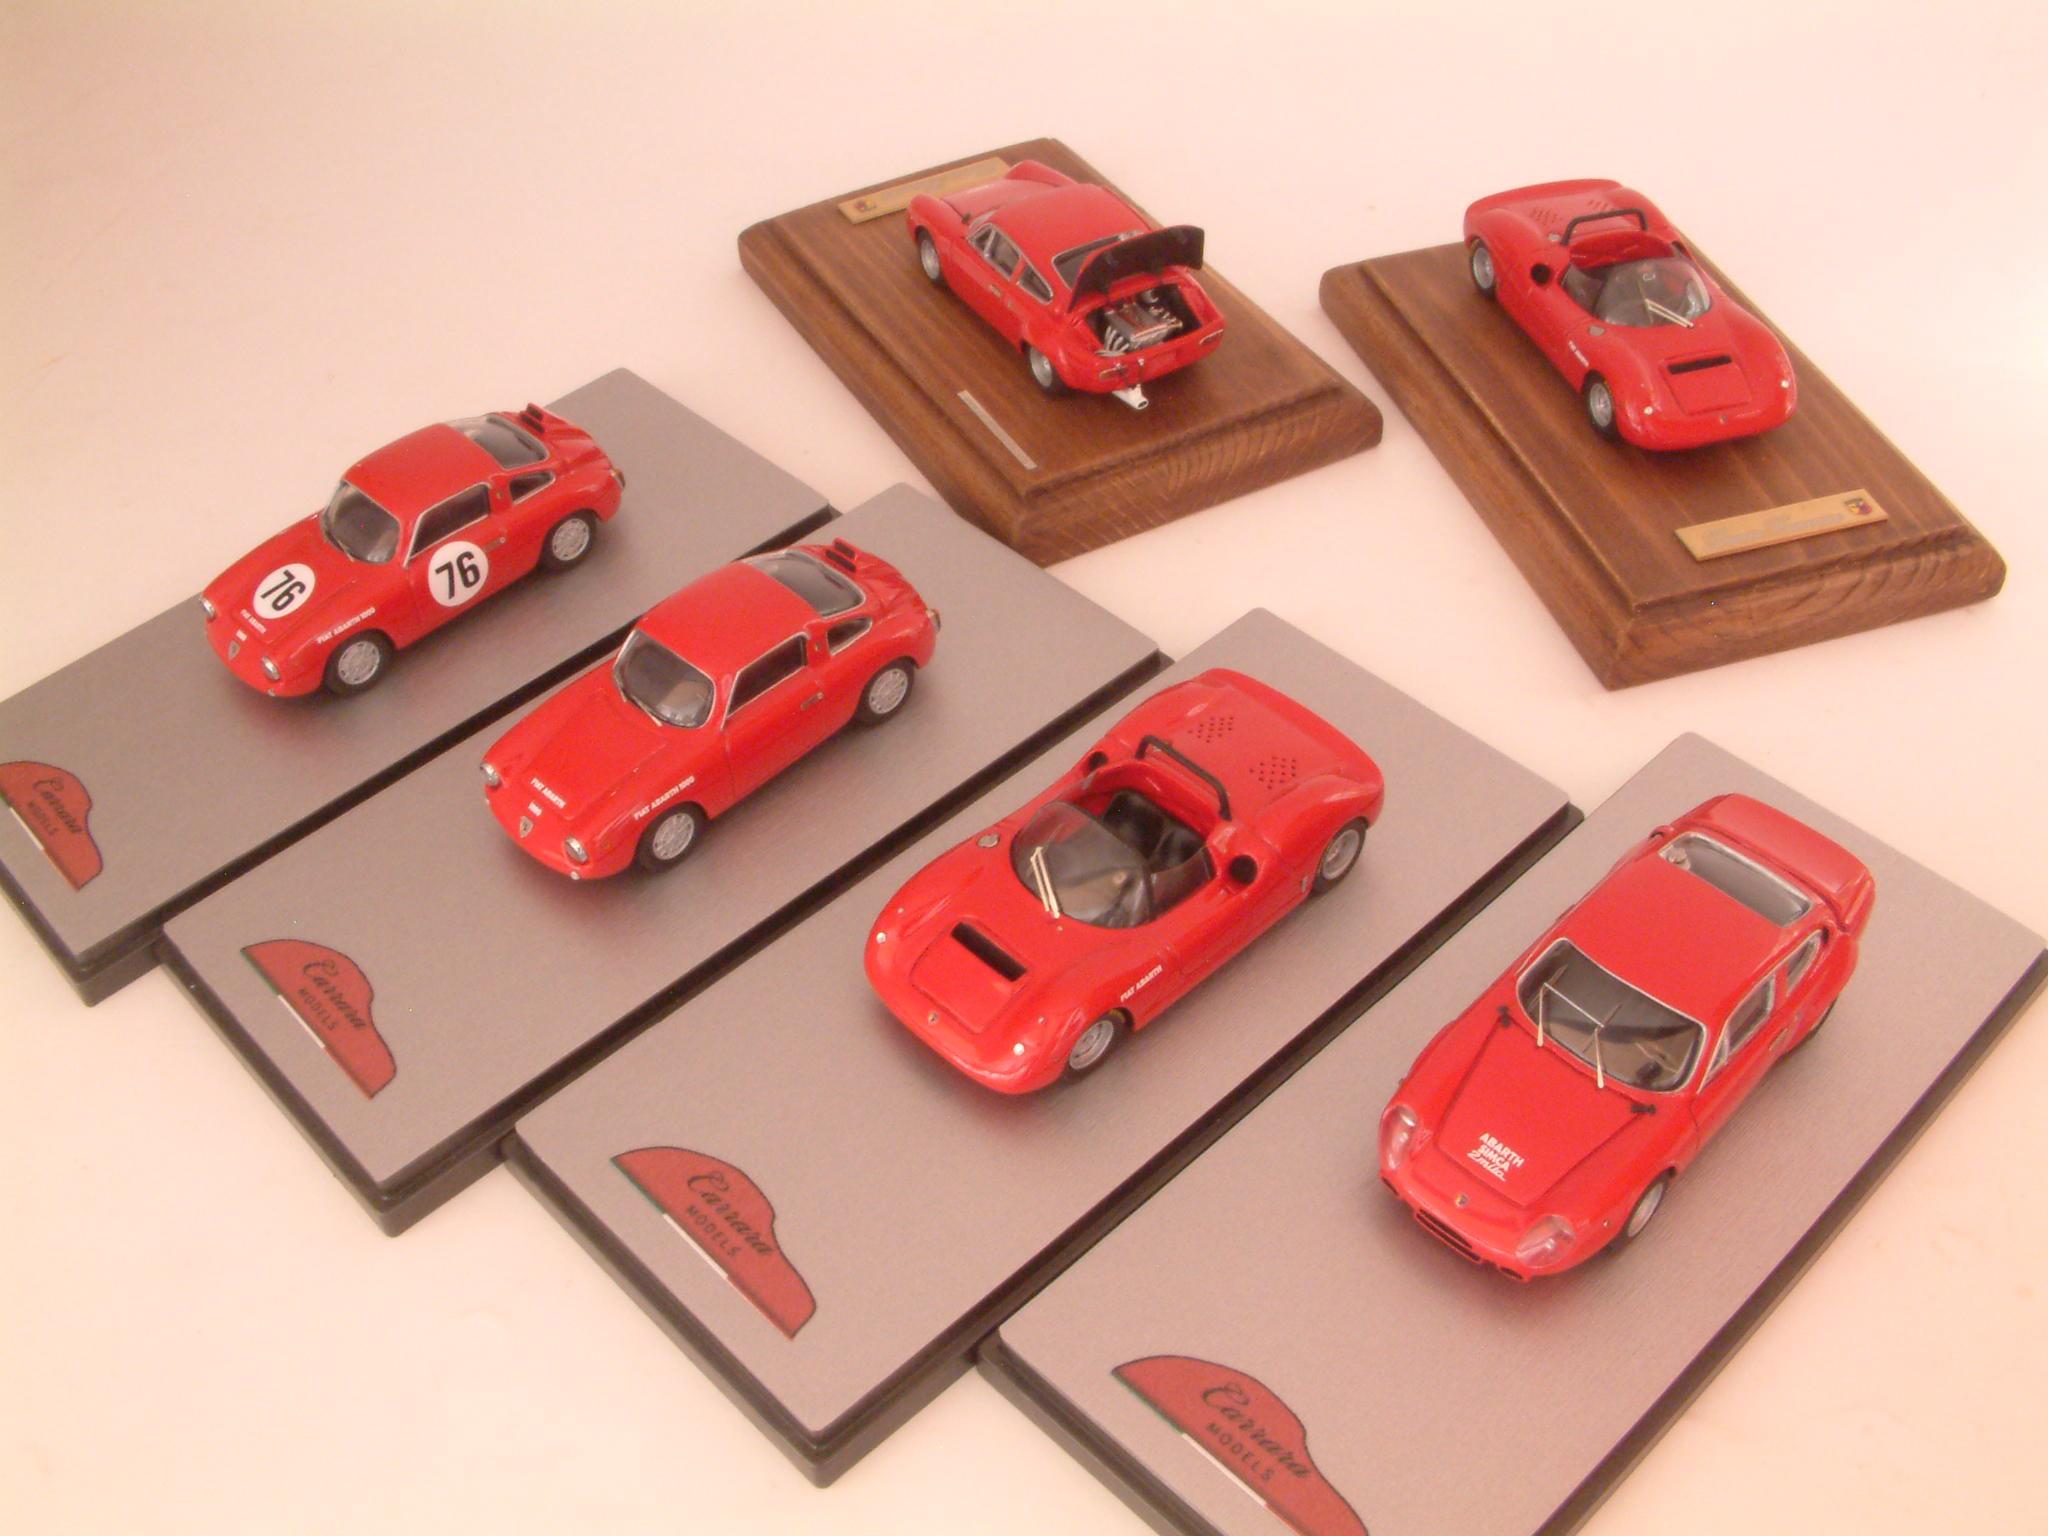 -Simca Abarth 2000 GT Corsa 1964 -Fiat Abarth 1300 SP Spider Tubolare 1966 -Fiat Abarth 1000 Bialbero 1960 -Fiat Abarth 1000 Bialbero #76 6 ore D'Auvergne 1961 Jean Guichet